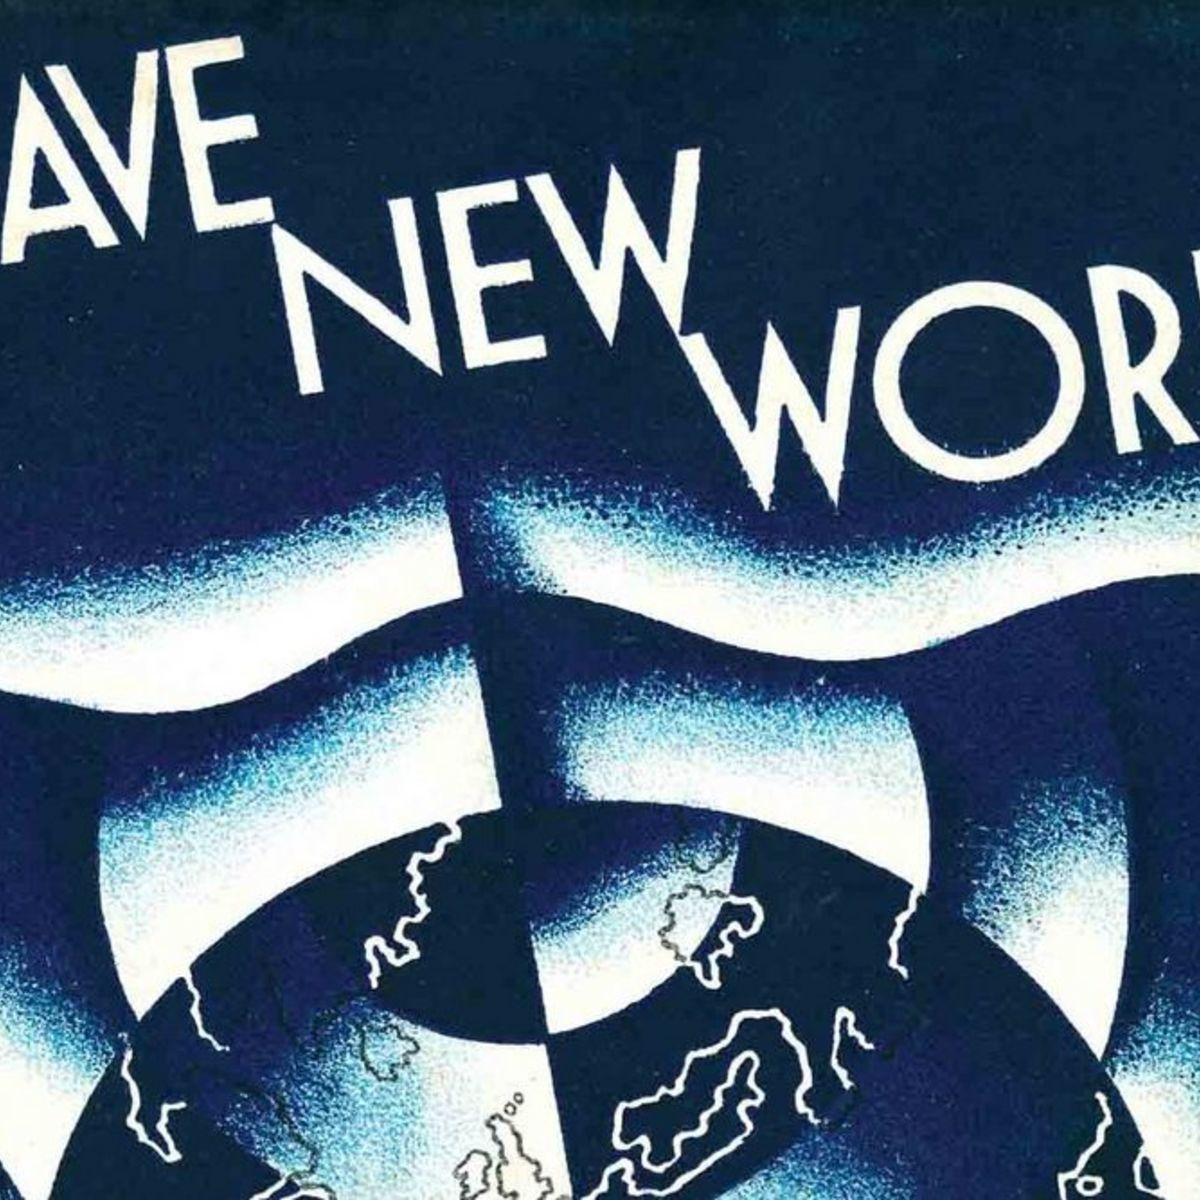 Brave_New_World.jpg